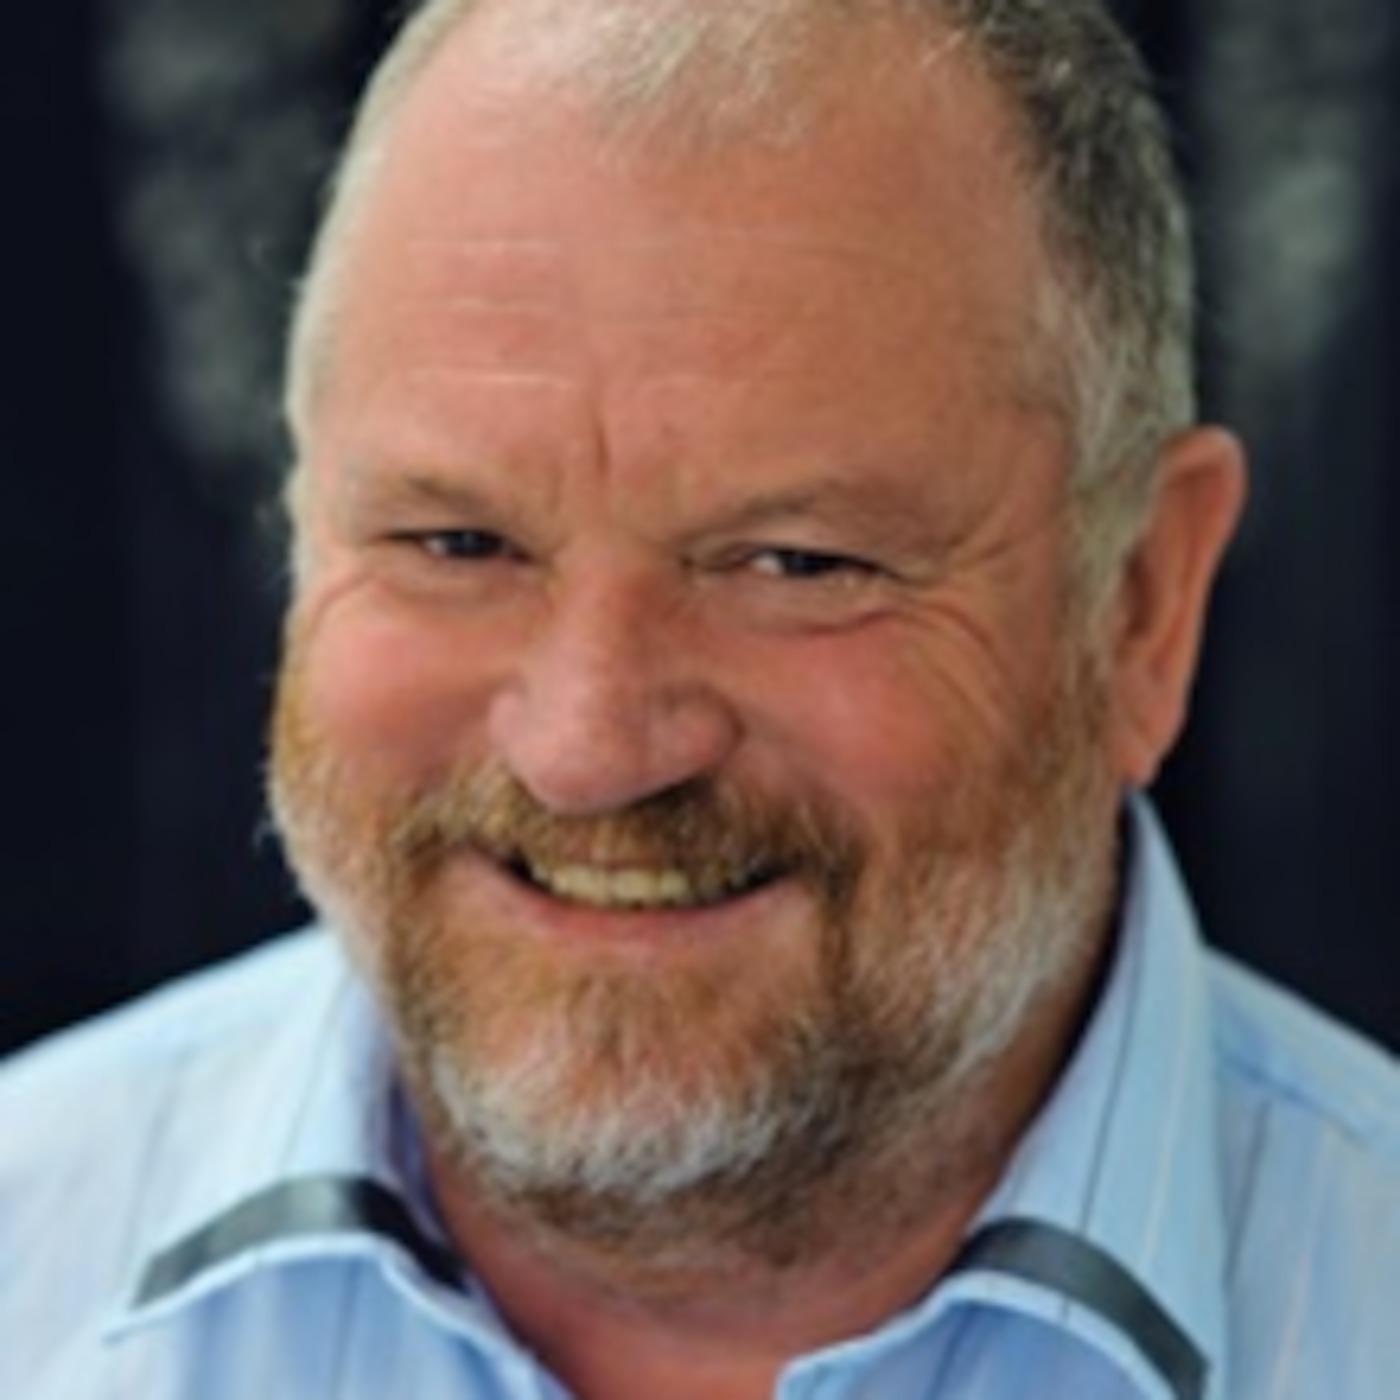 Interview with Tim Malloy, RNZCGP